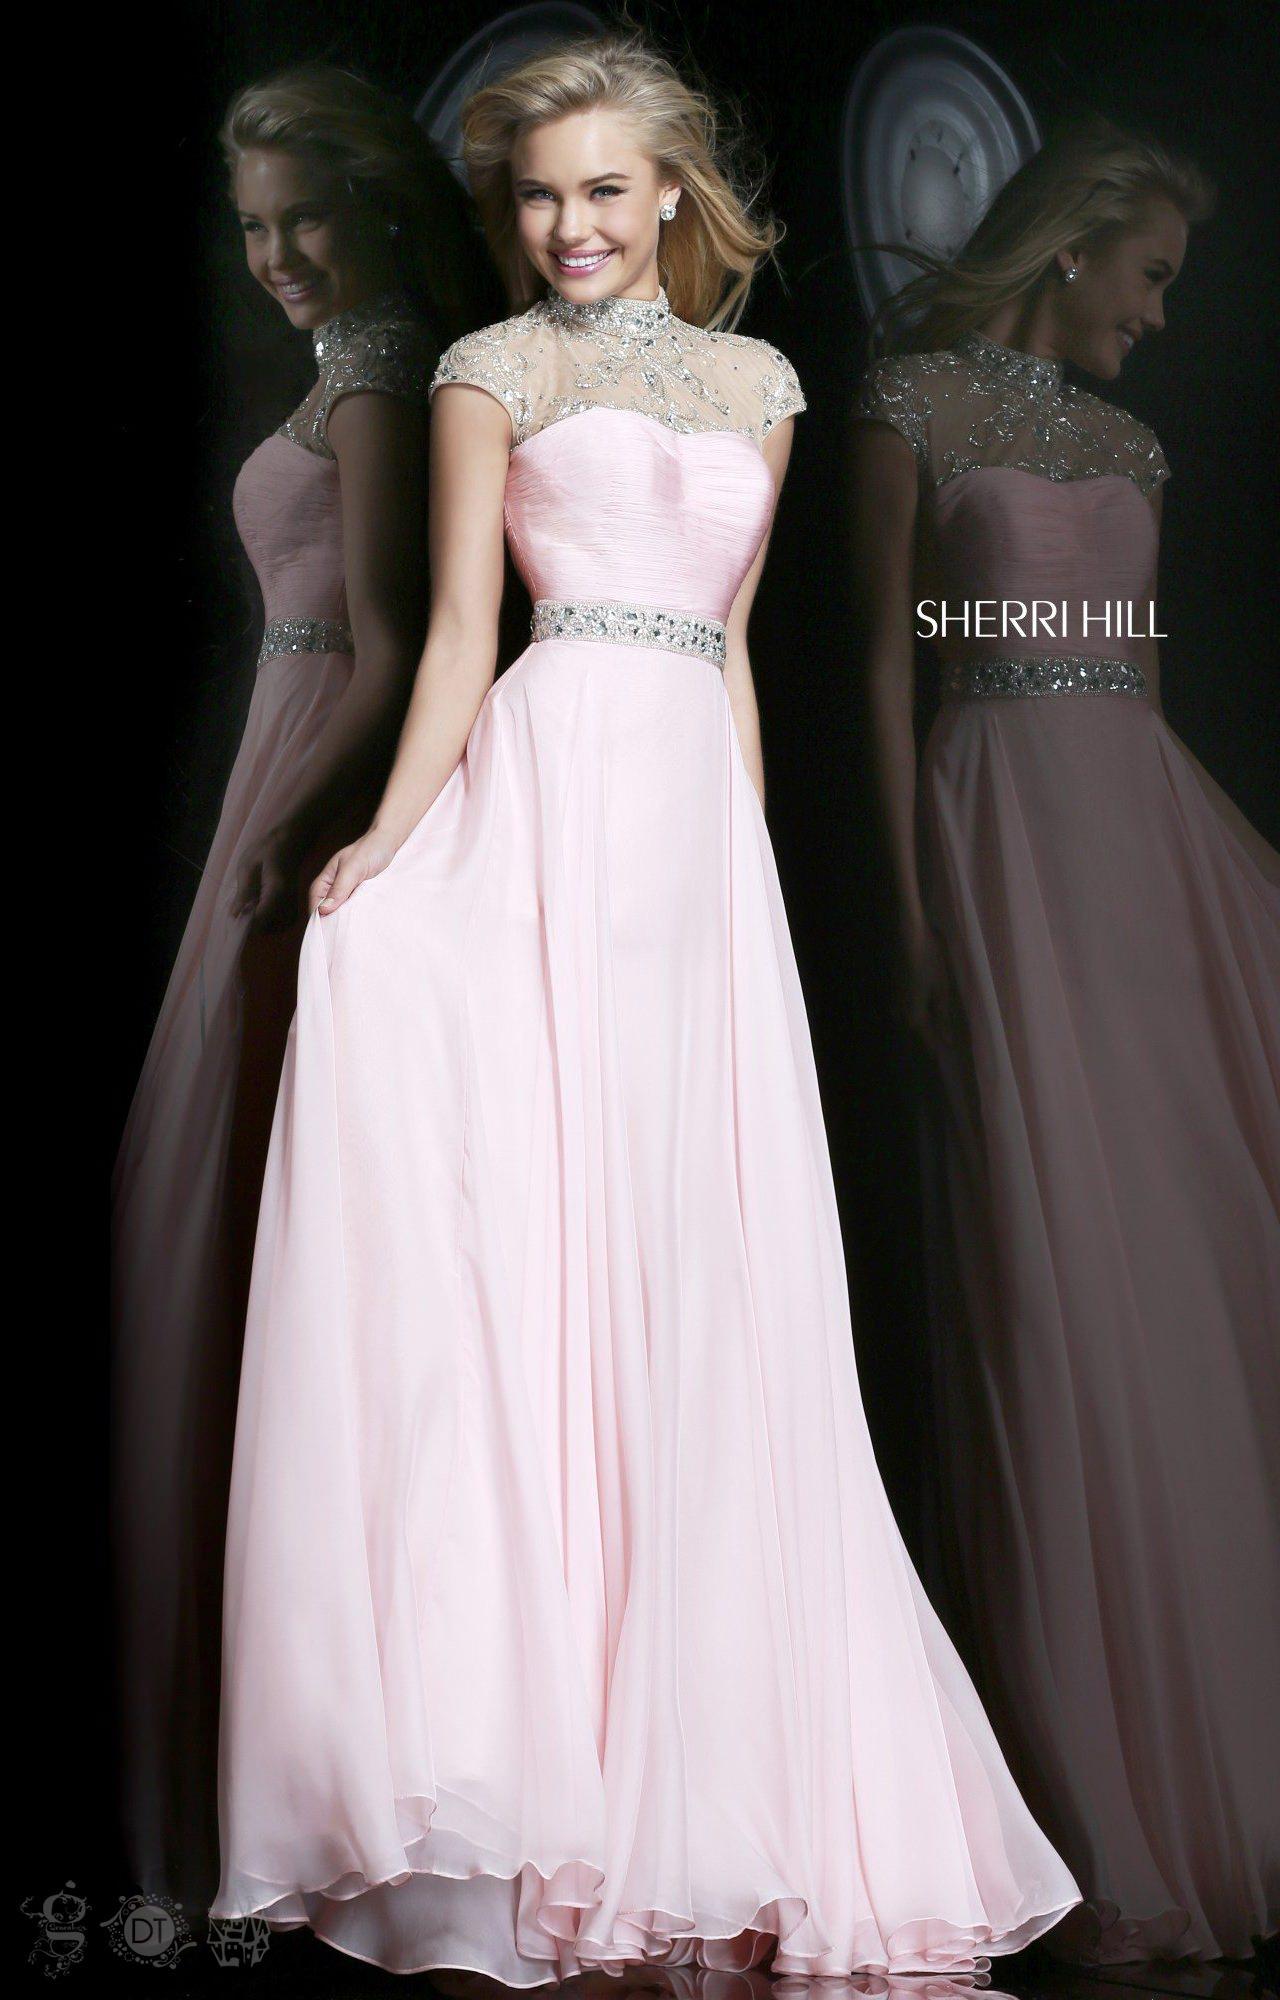 Prom dresses durham nc vosoi prom dresses in durham best dressed ombrellifo Choice Image